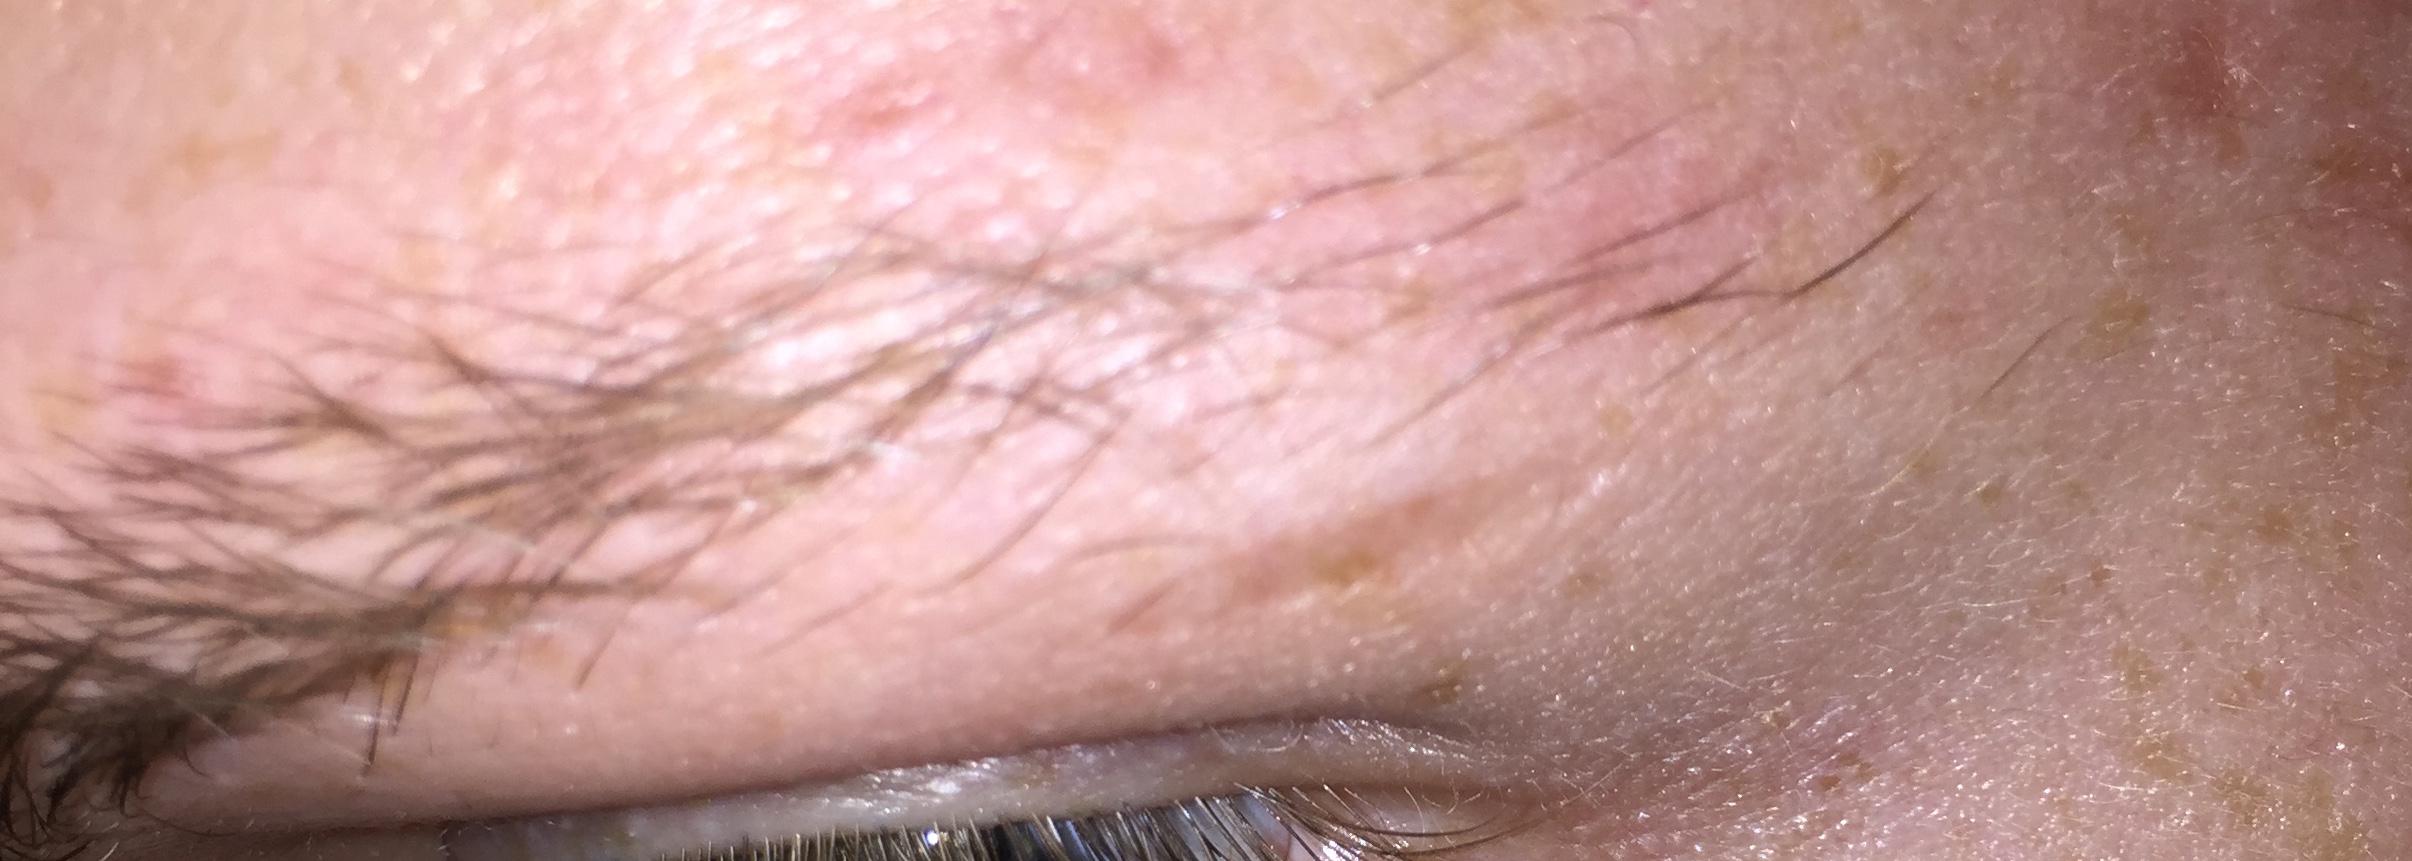 Eyebrow hair loss itching